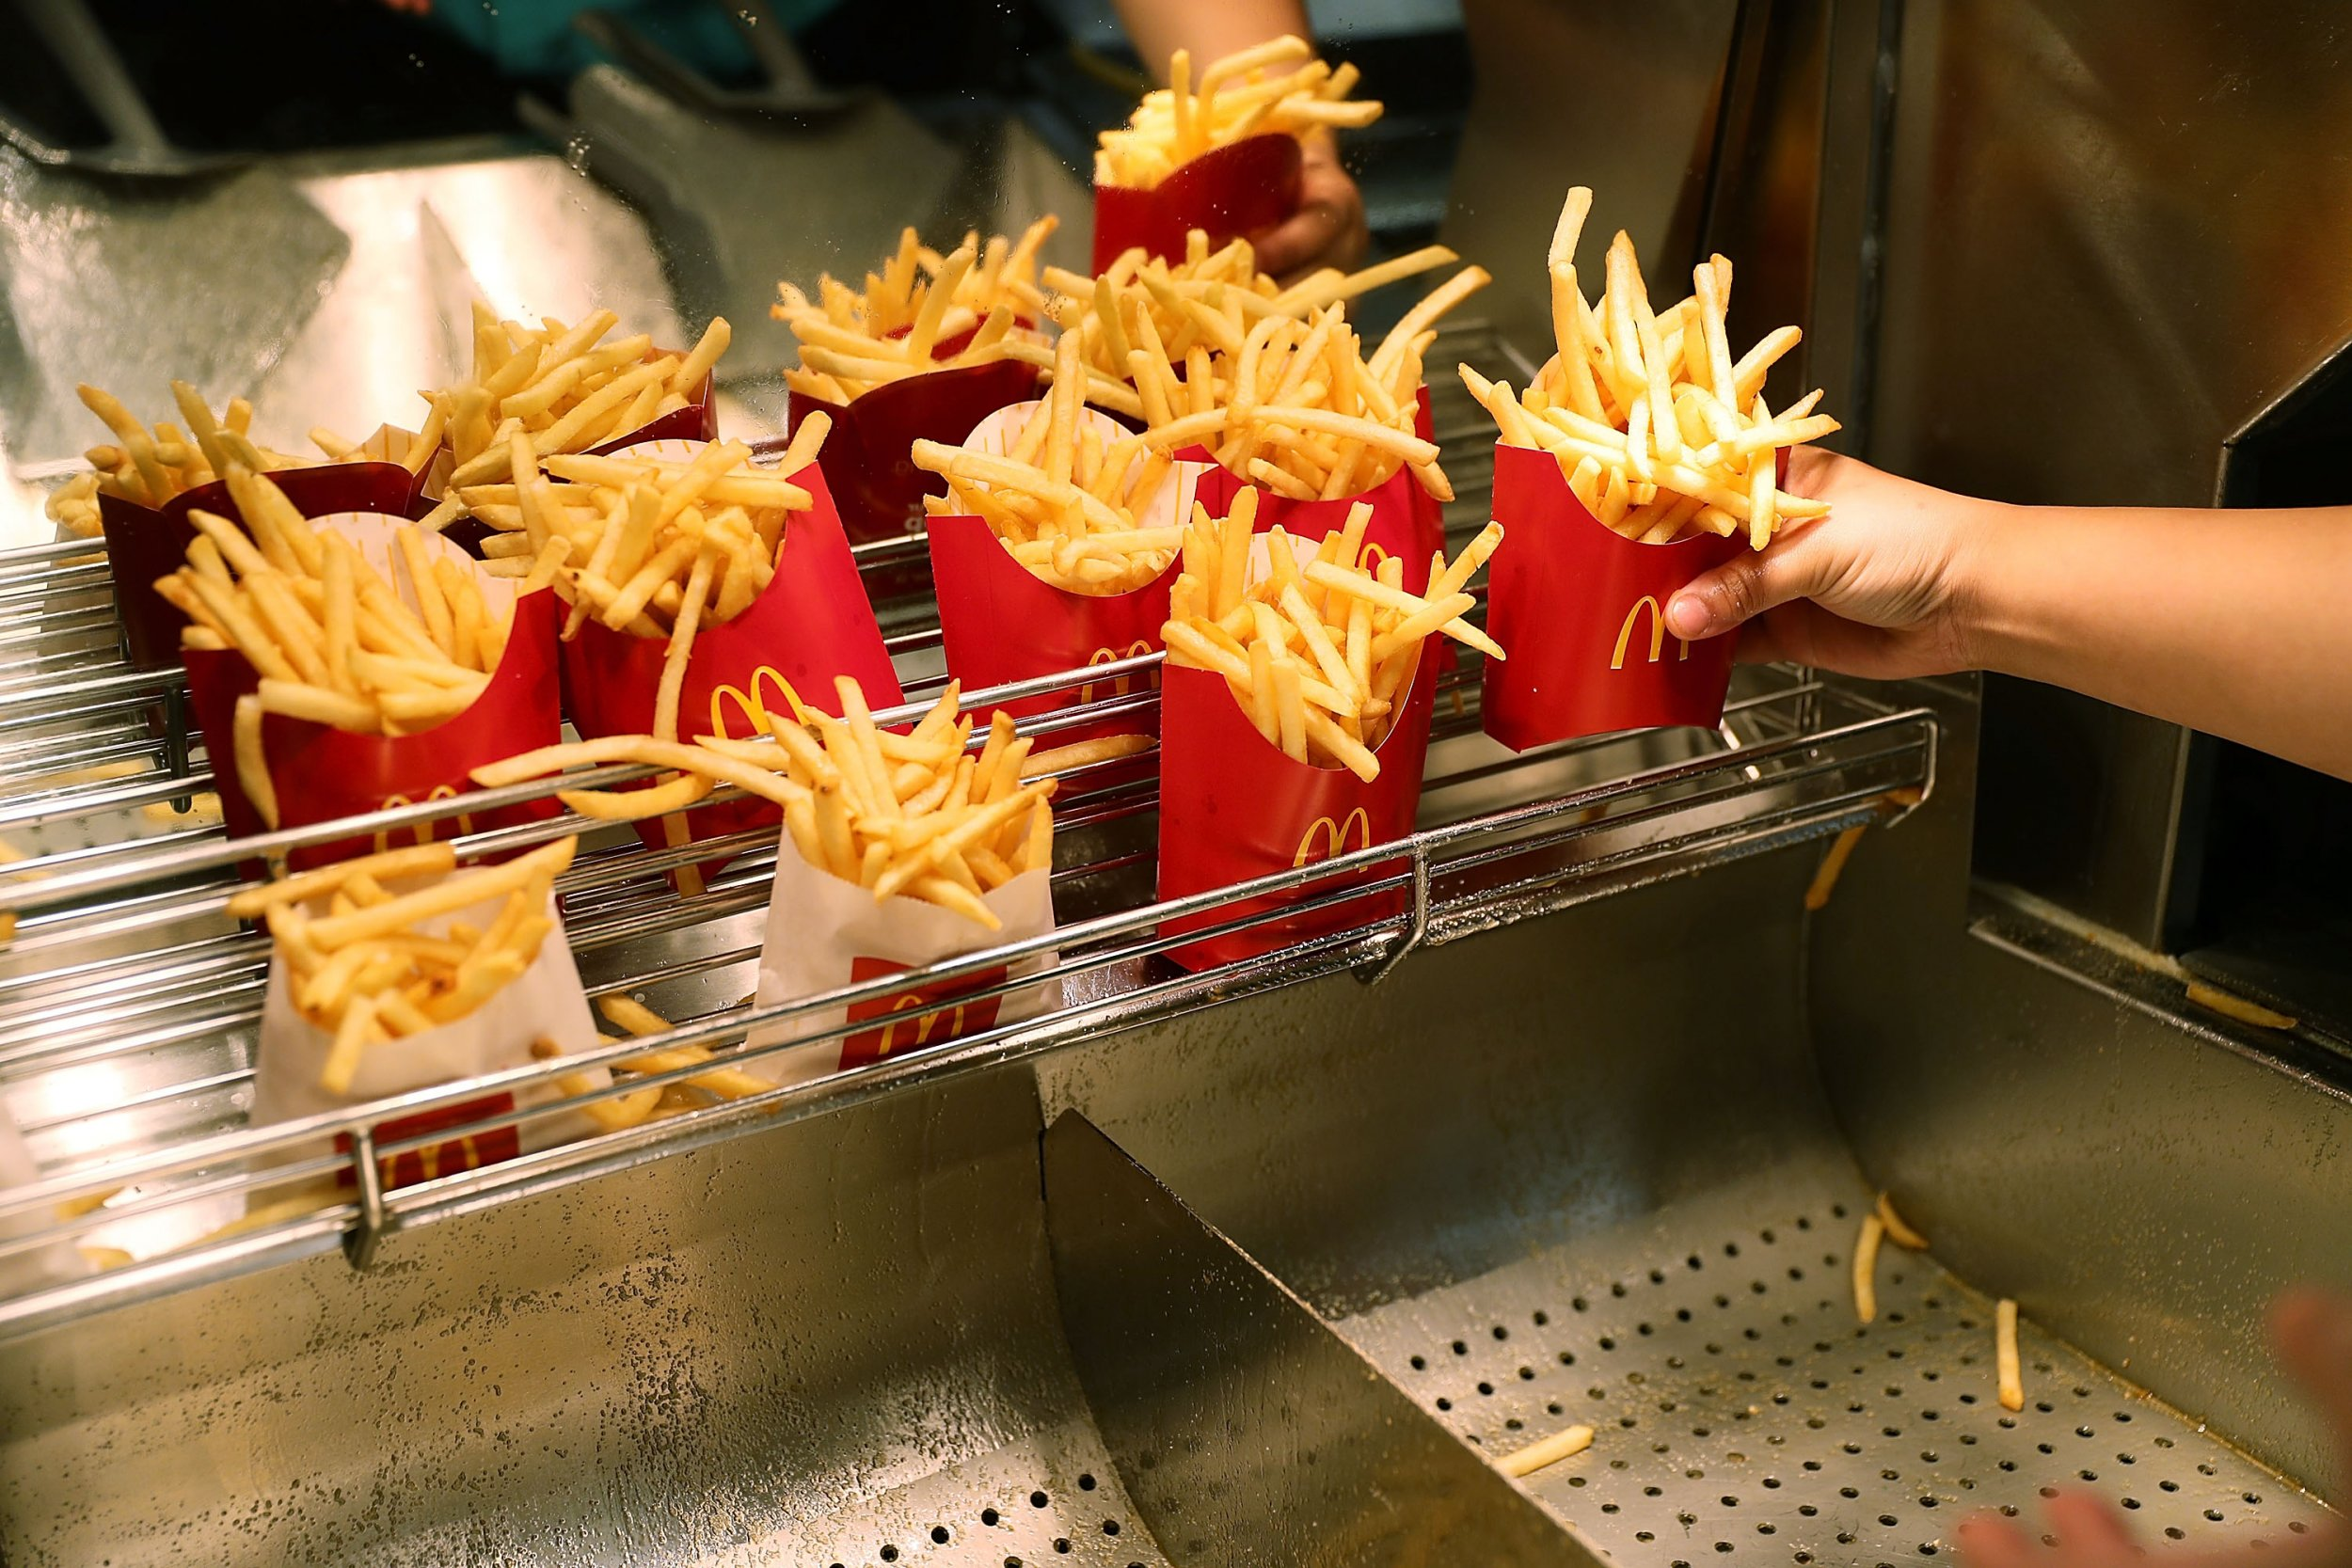 Mcdonalds Kentucky Fried Chicken Or Taco Bell Eating Junk Food